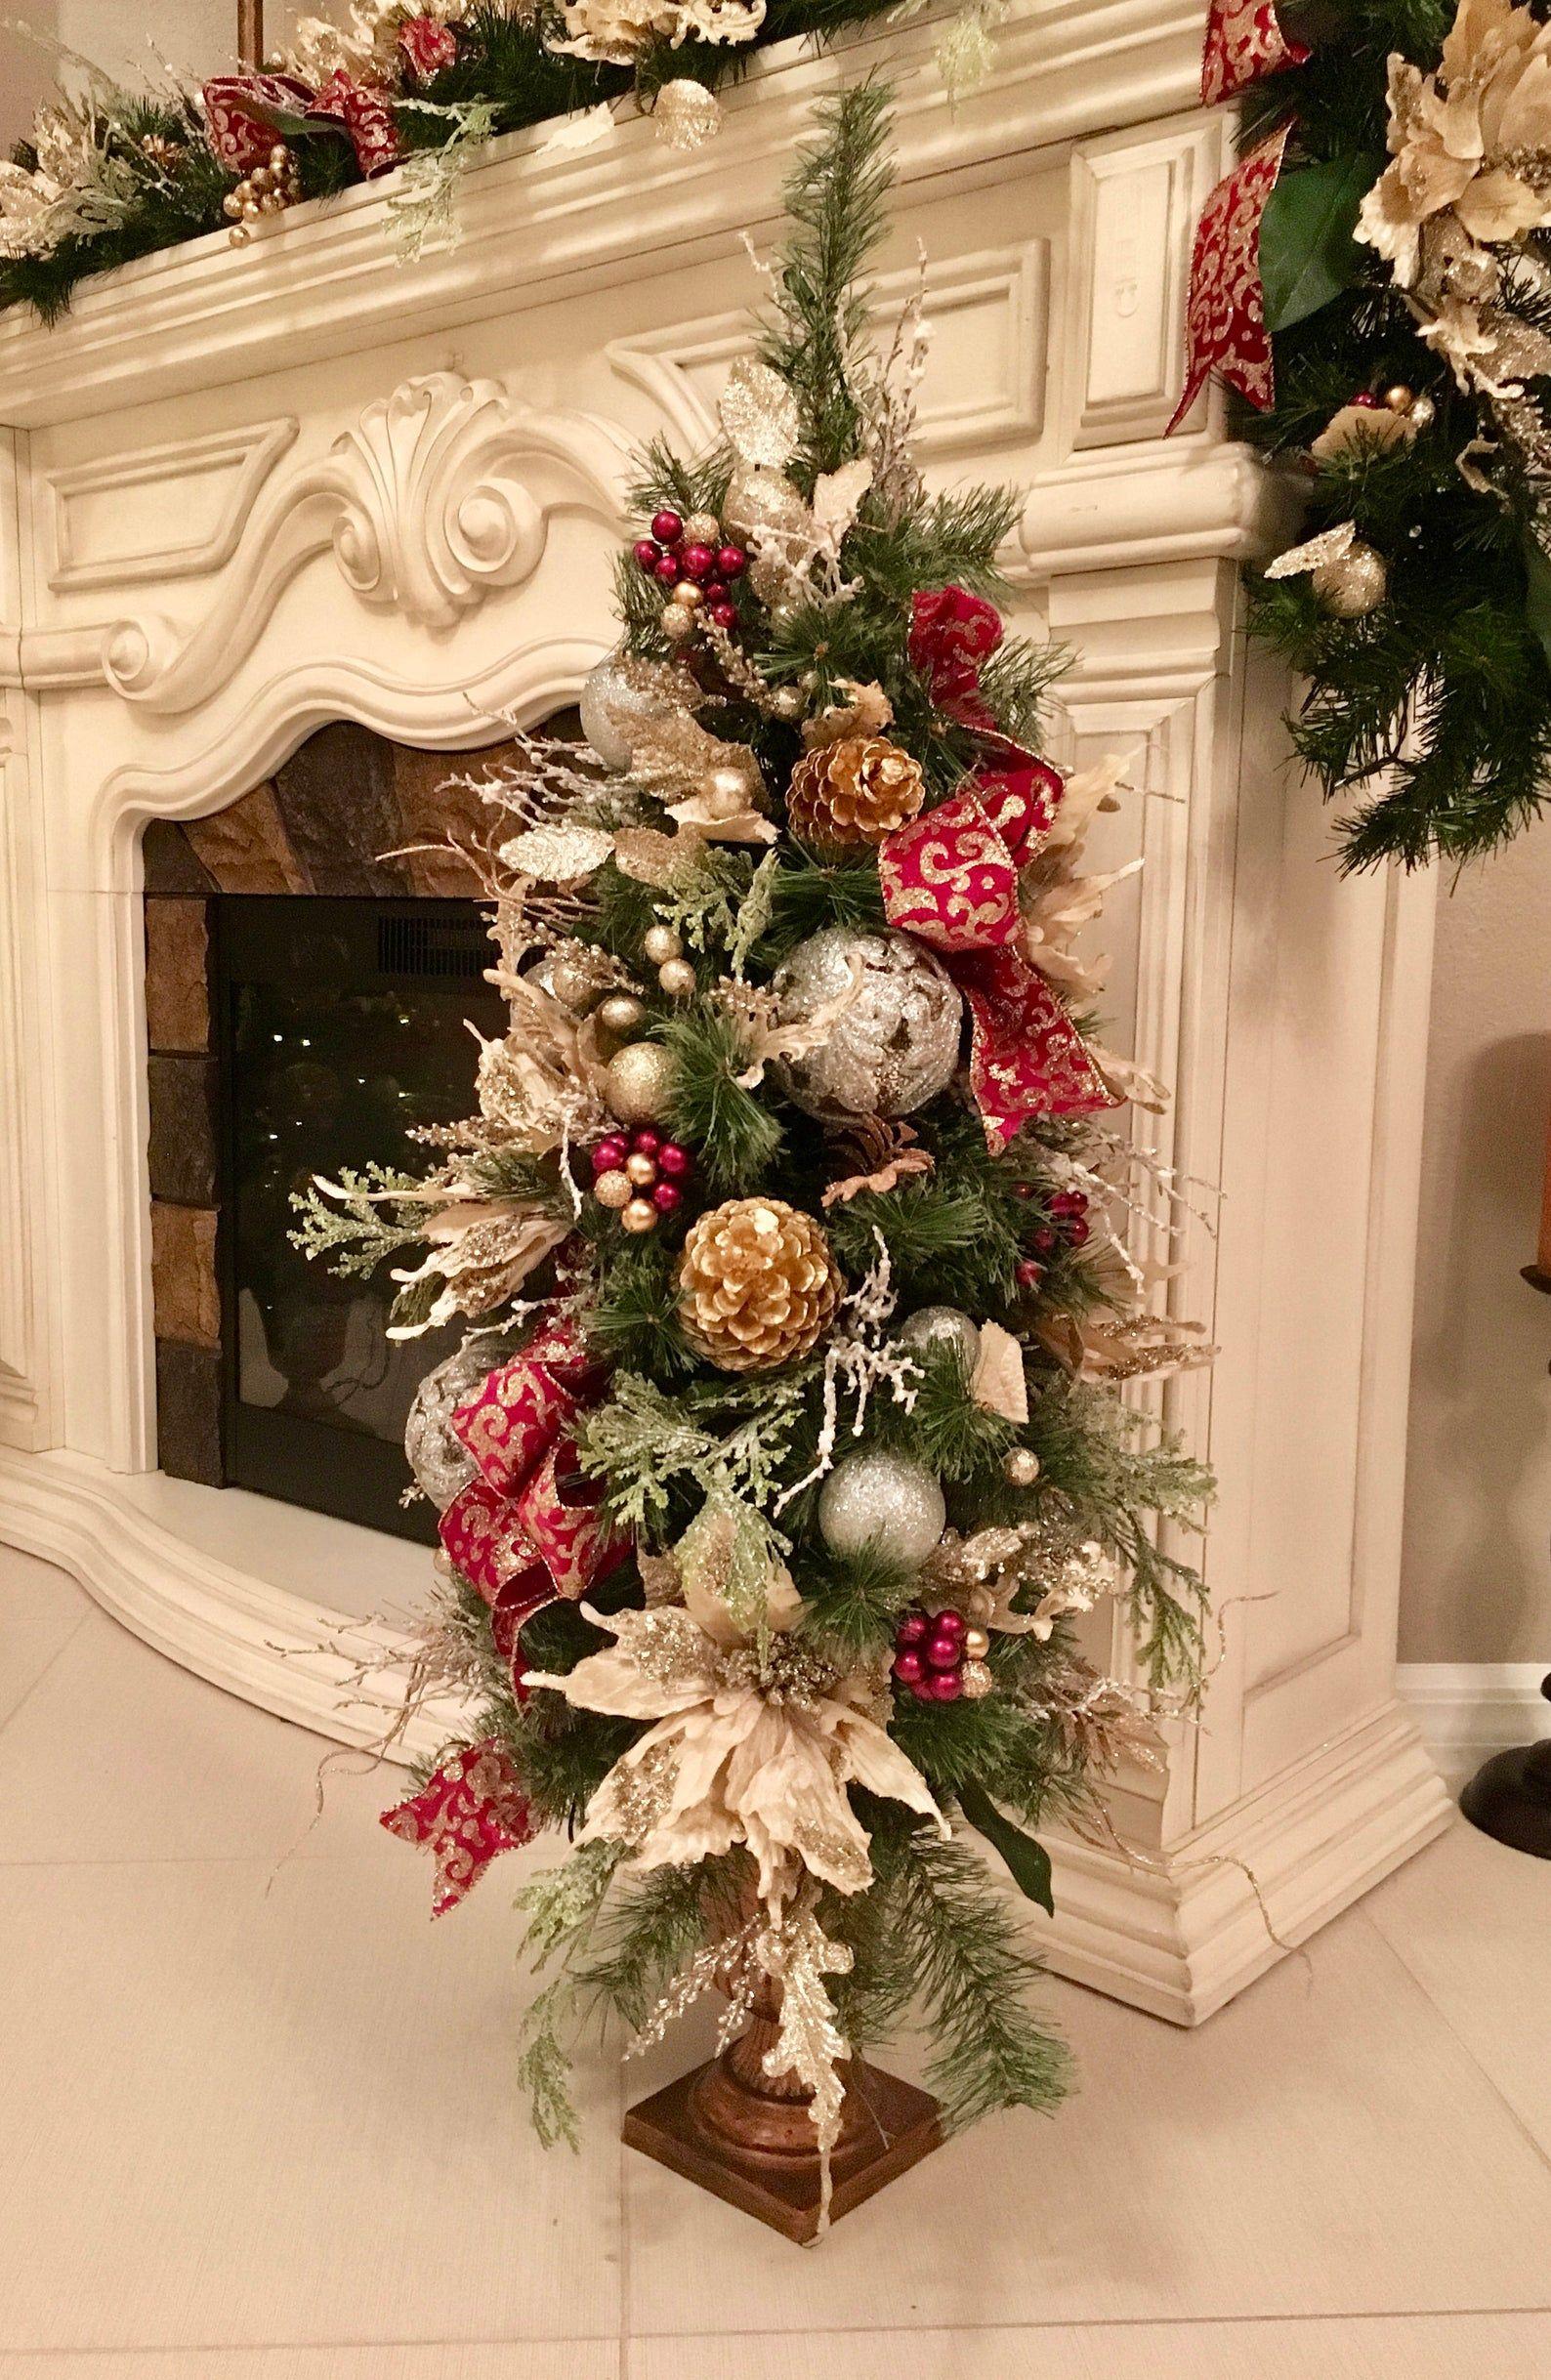 "Velvet White Poinsettia 42"" tall Christmas Topiary. FREE SHIPPING 150 LED Pre-Light, Only one ..."